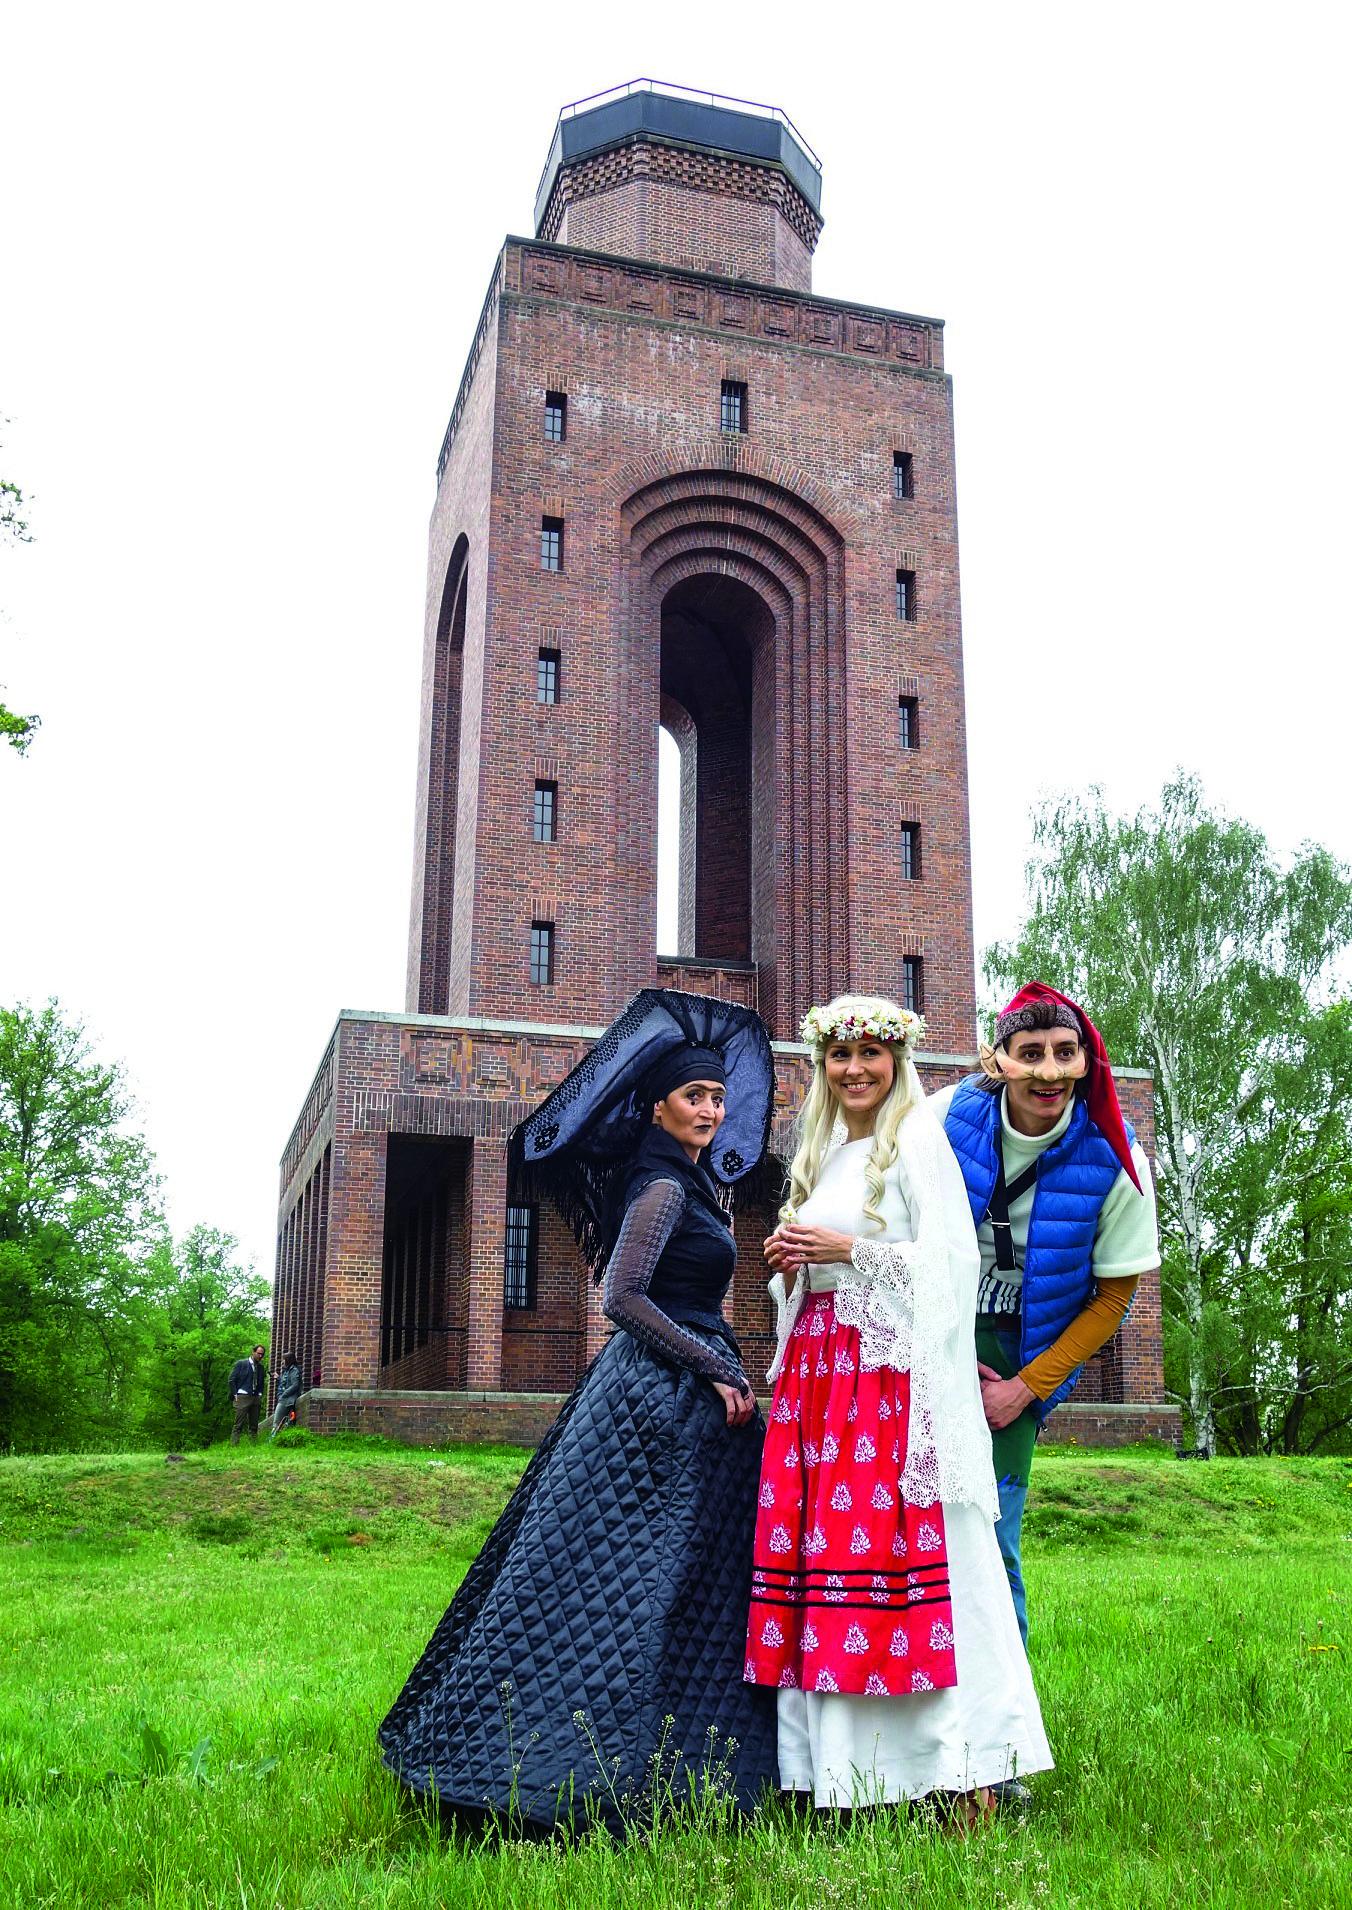 Wurlawa, schwarze Zauberin (Julia Peickert), Anka, Braut des Wendenkönigs (Elke Zeh) und Lutk Jorko (Jakob Schäfer)